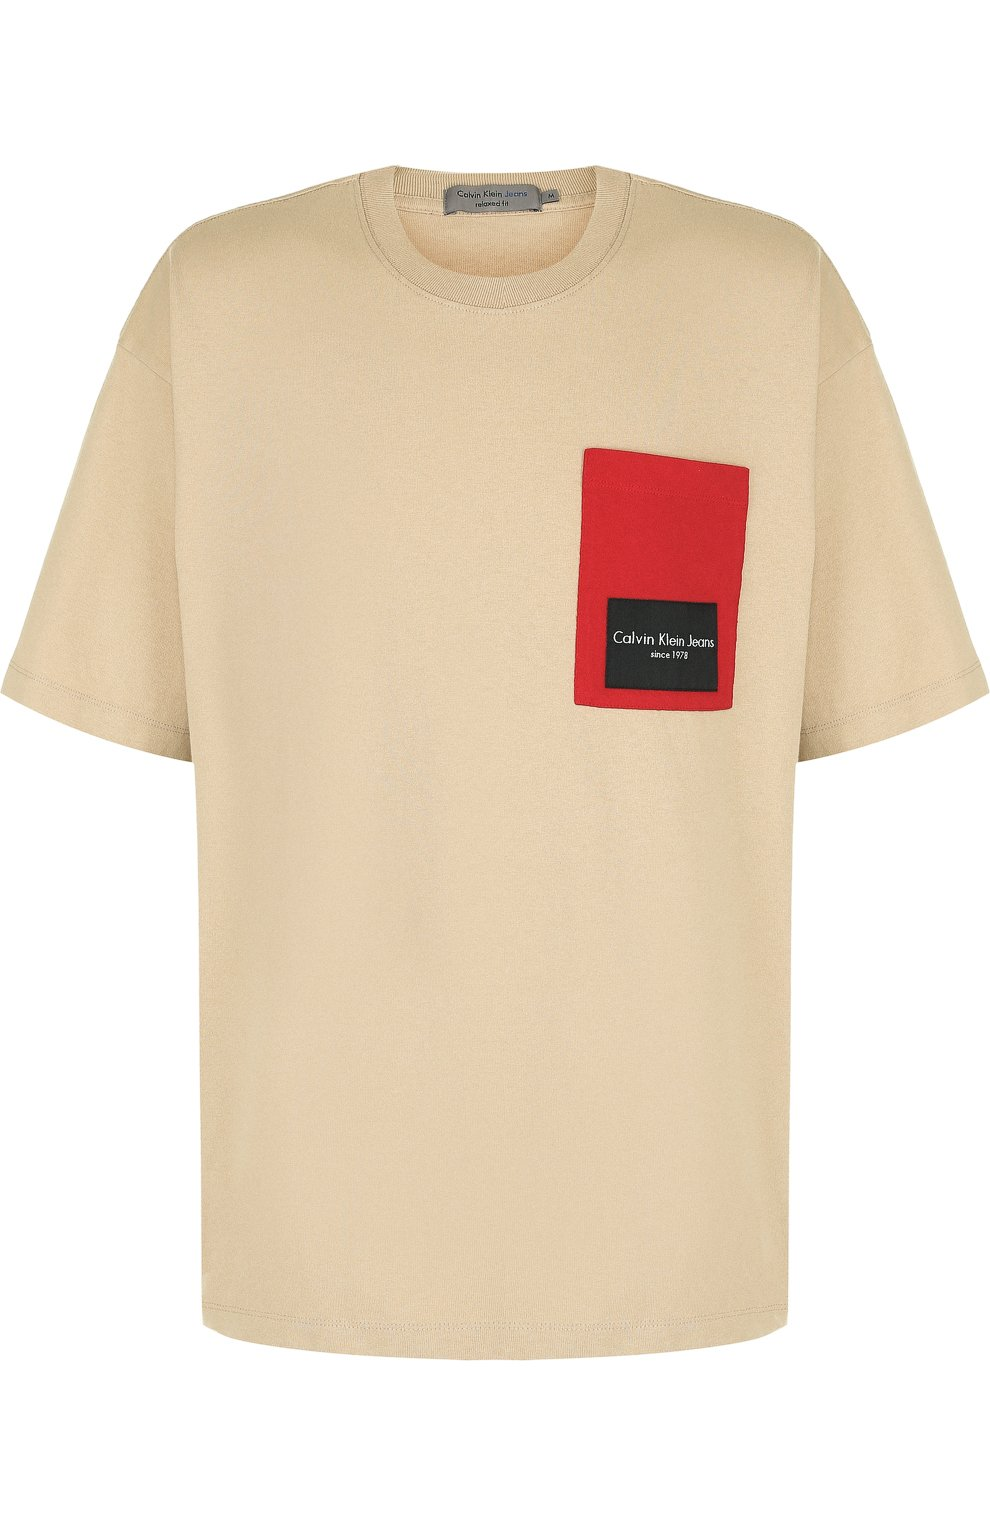 Хлопковая футболка свободного кроя Calvin Klein Jeans бежевая | Фото №1